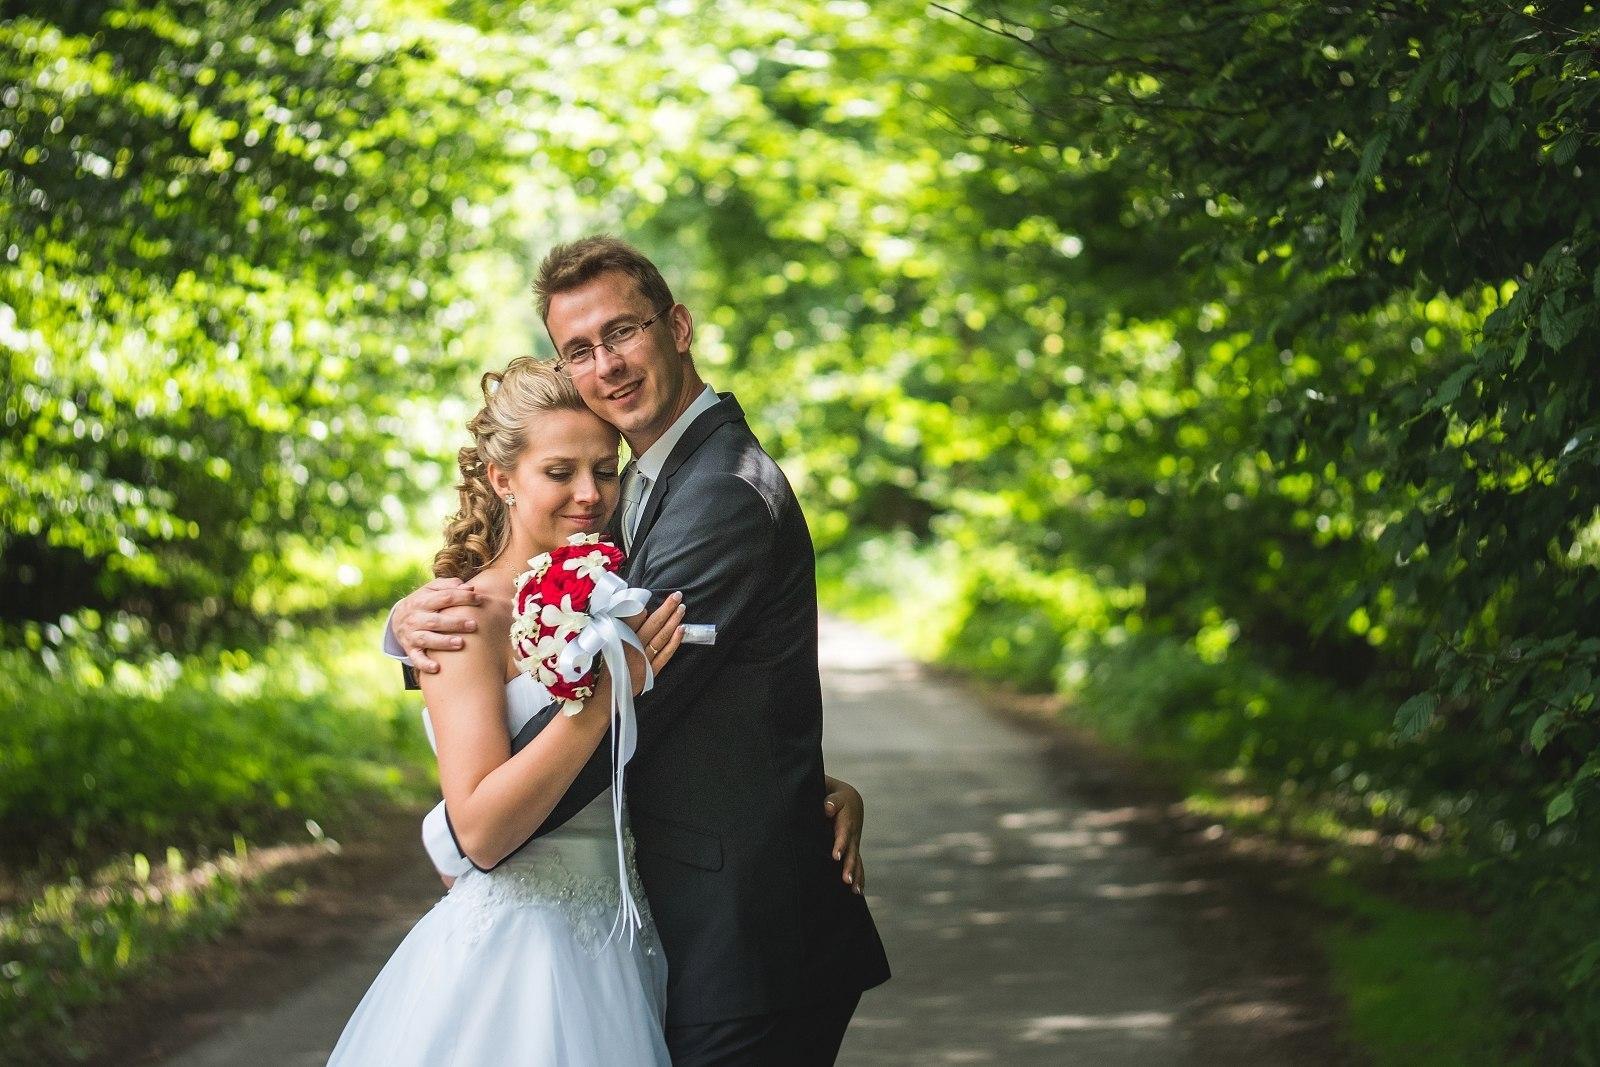 Svatba Anička&Jirka - Obrázek č. 5